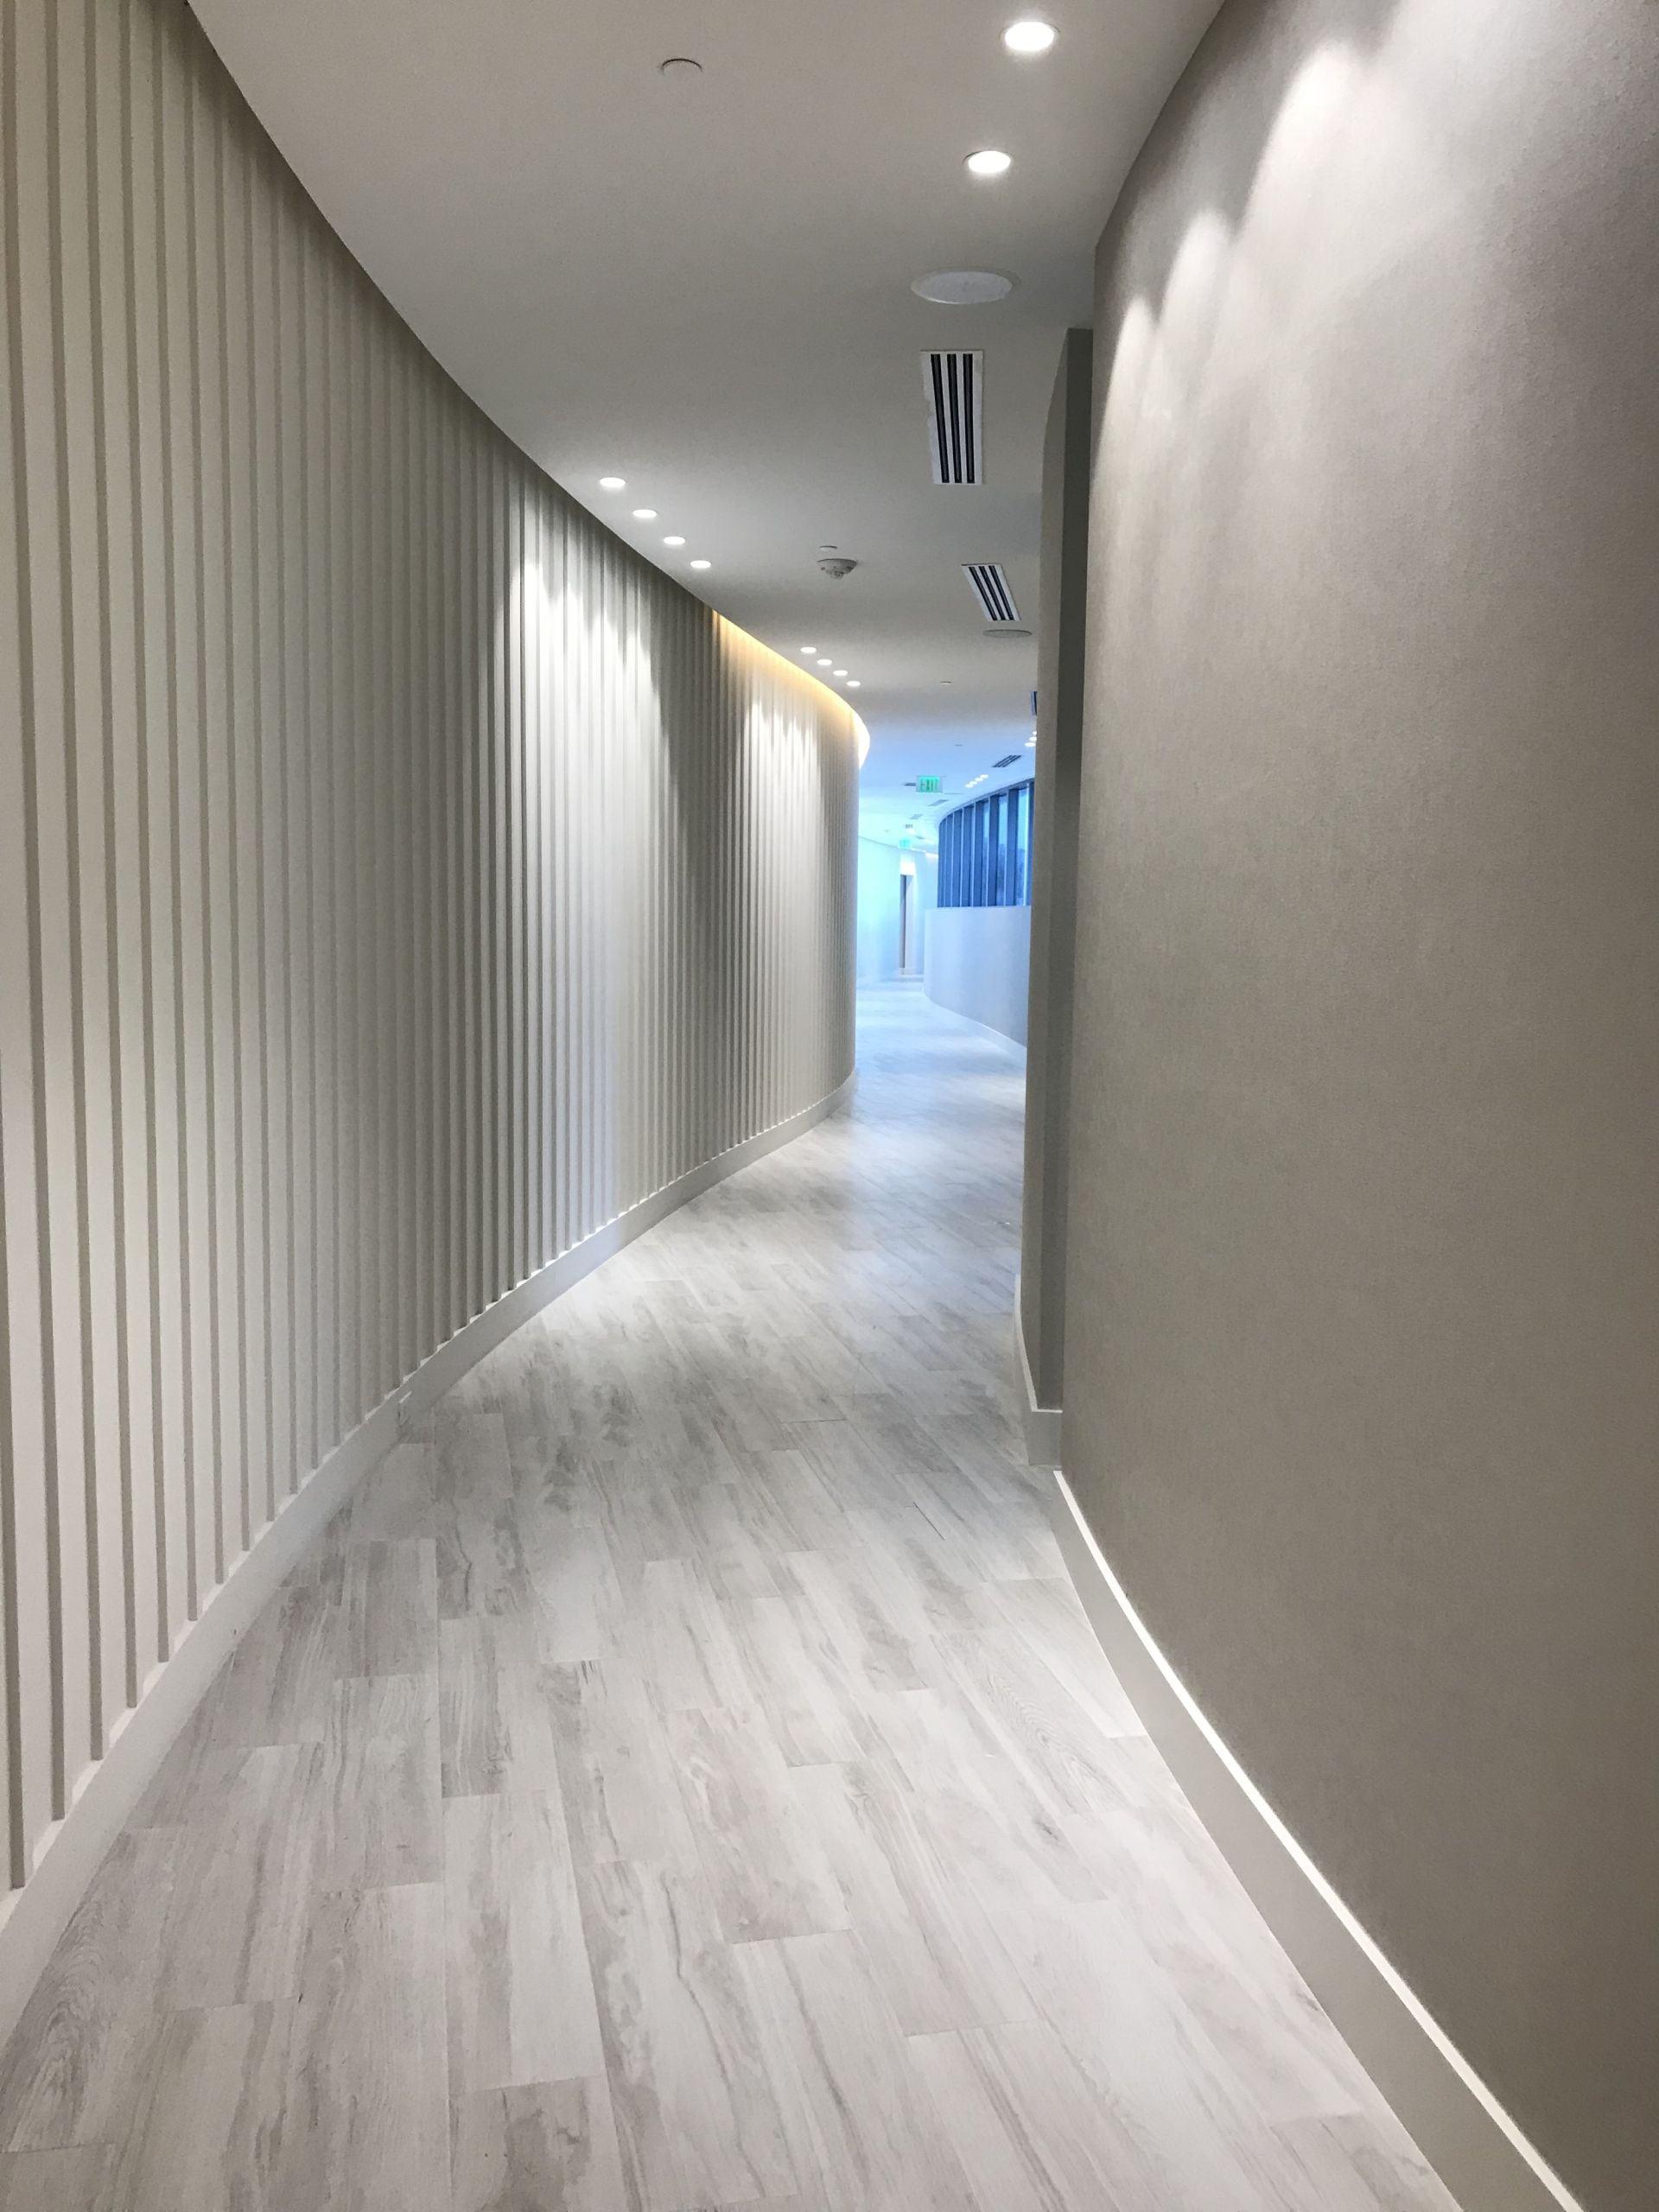 Park Grove hallway to amenities